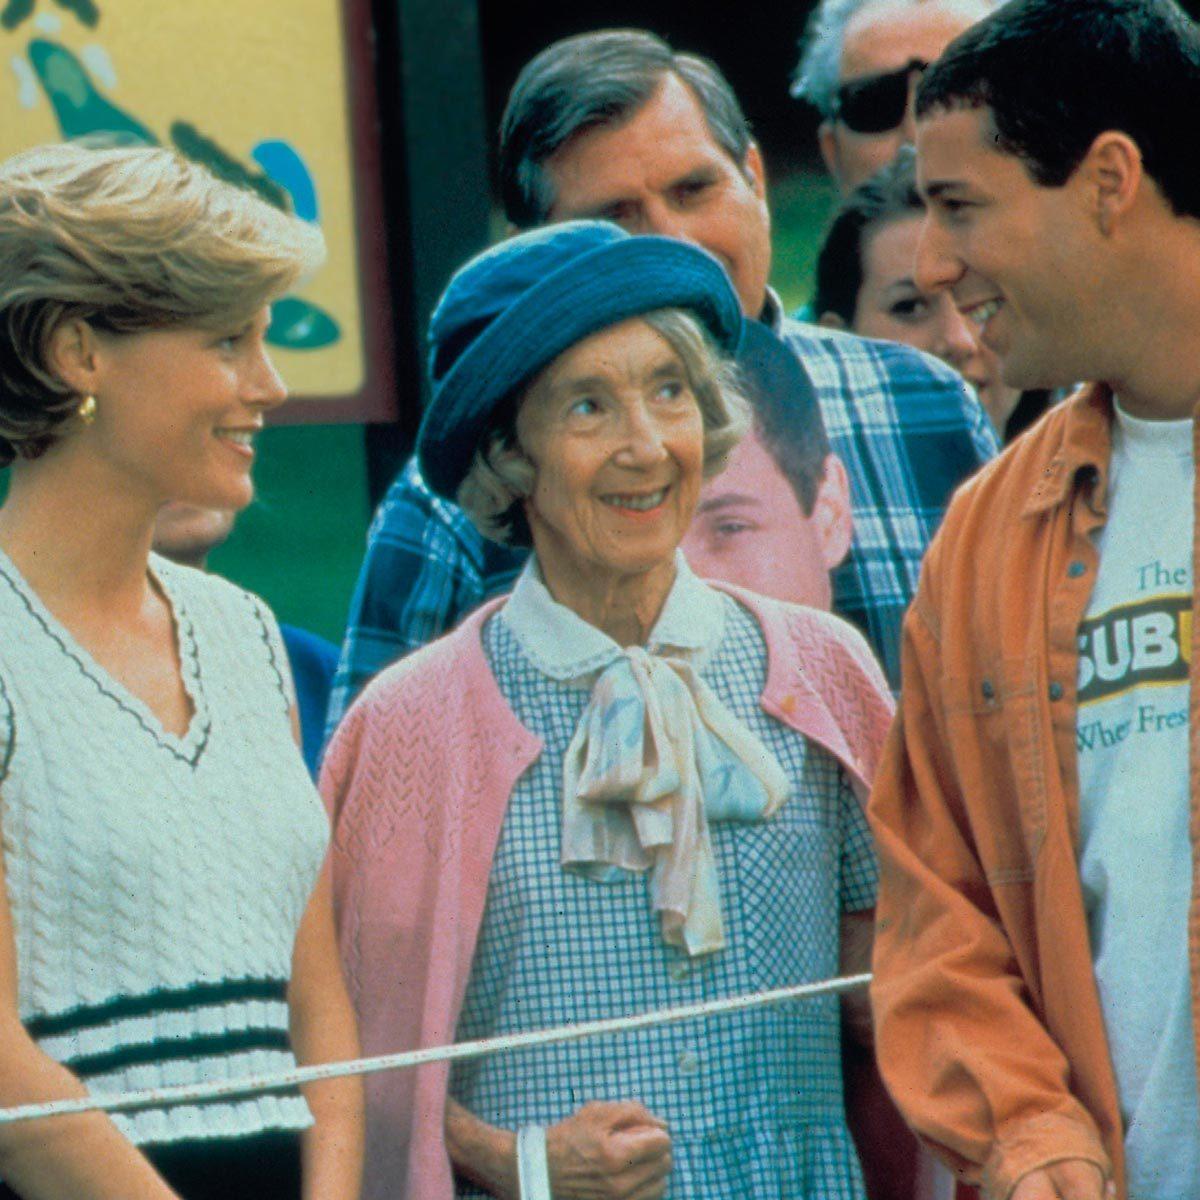 Happy Gilmore movie still